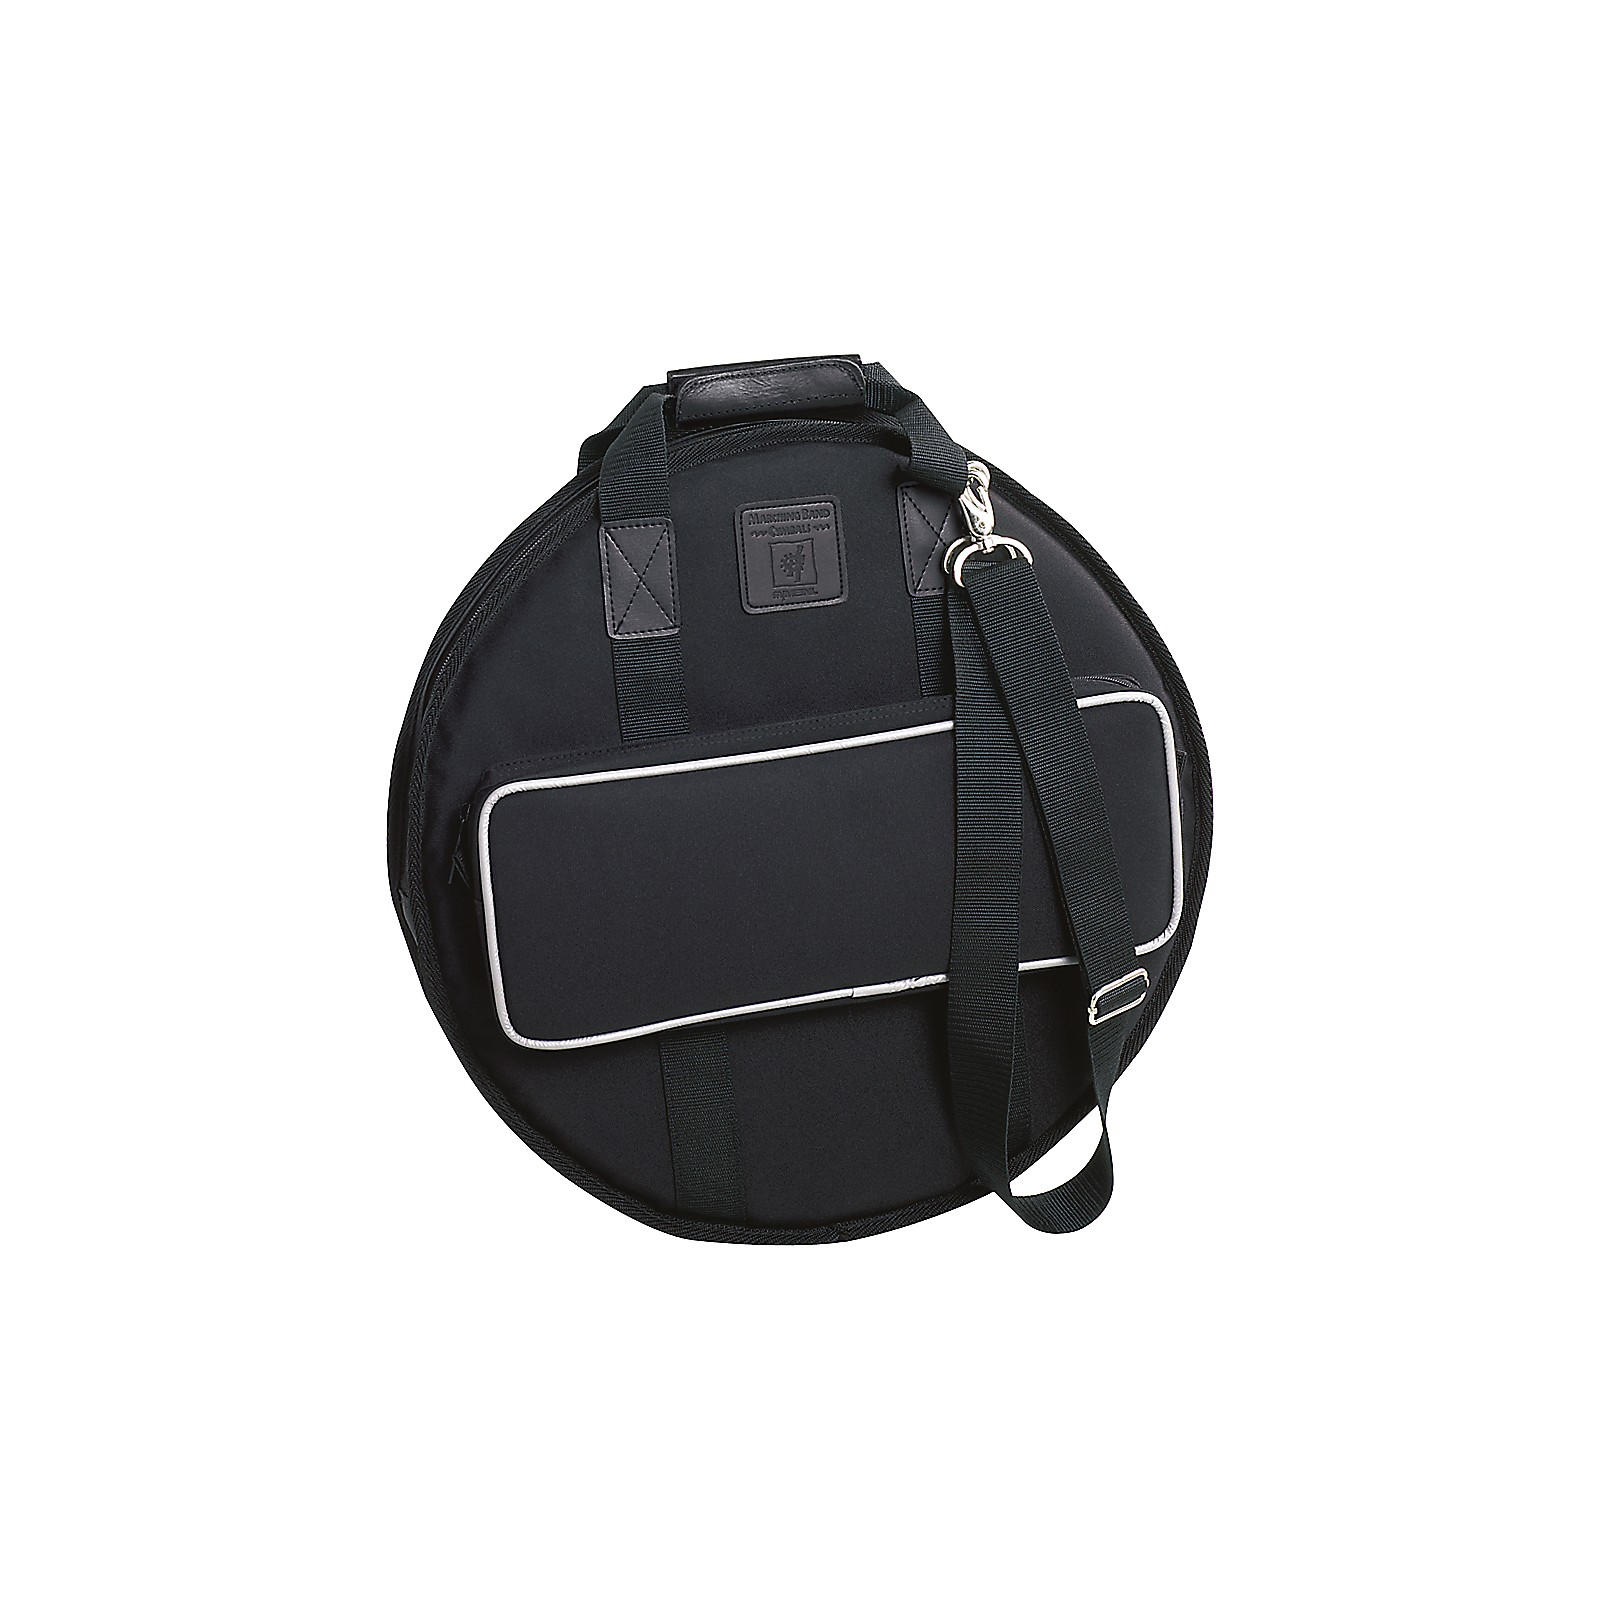 Meinl Drum Gear Professional Cymbal Bag